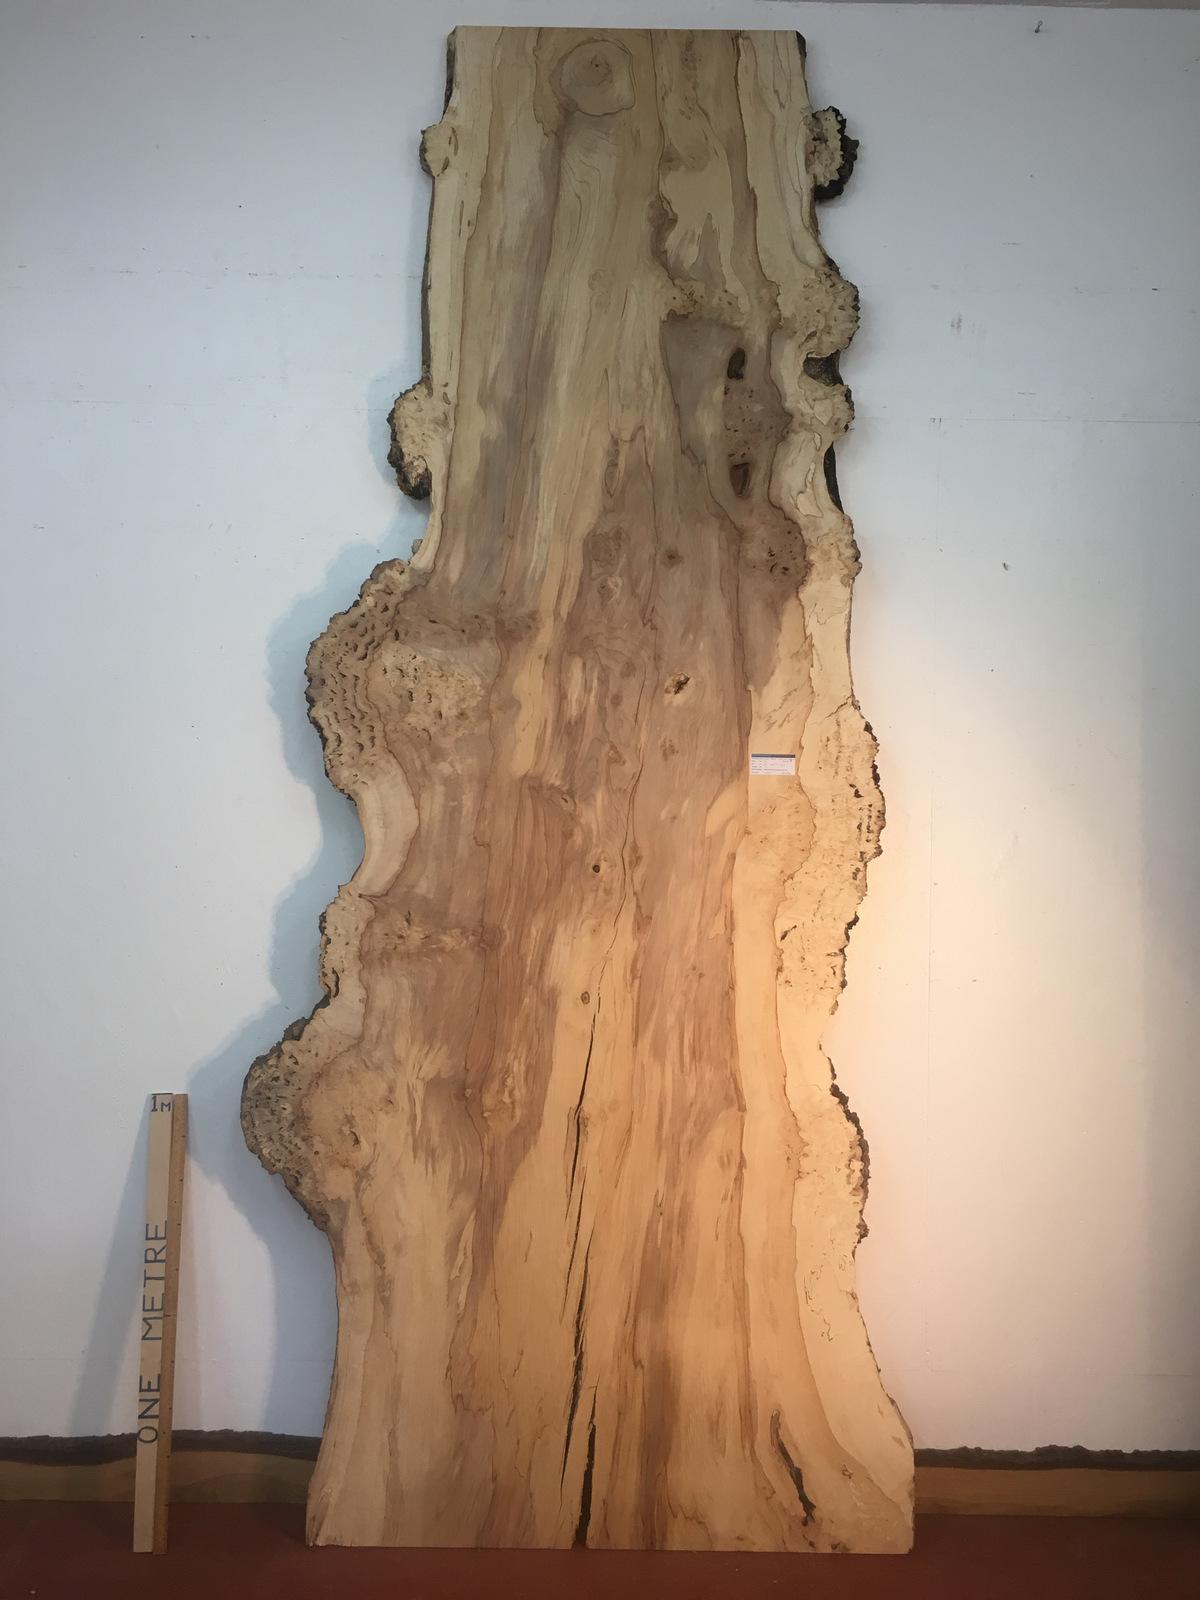 BURRY HORSE CHESTNUT Natural Waney Live Edge Slab Wood Board 1390A-8